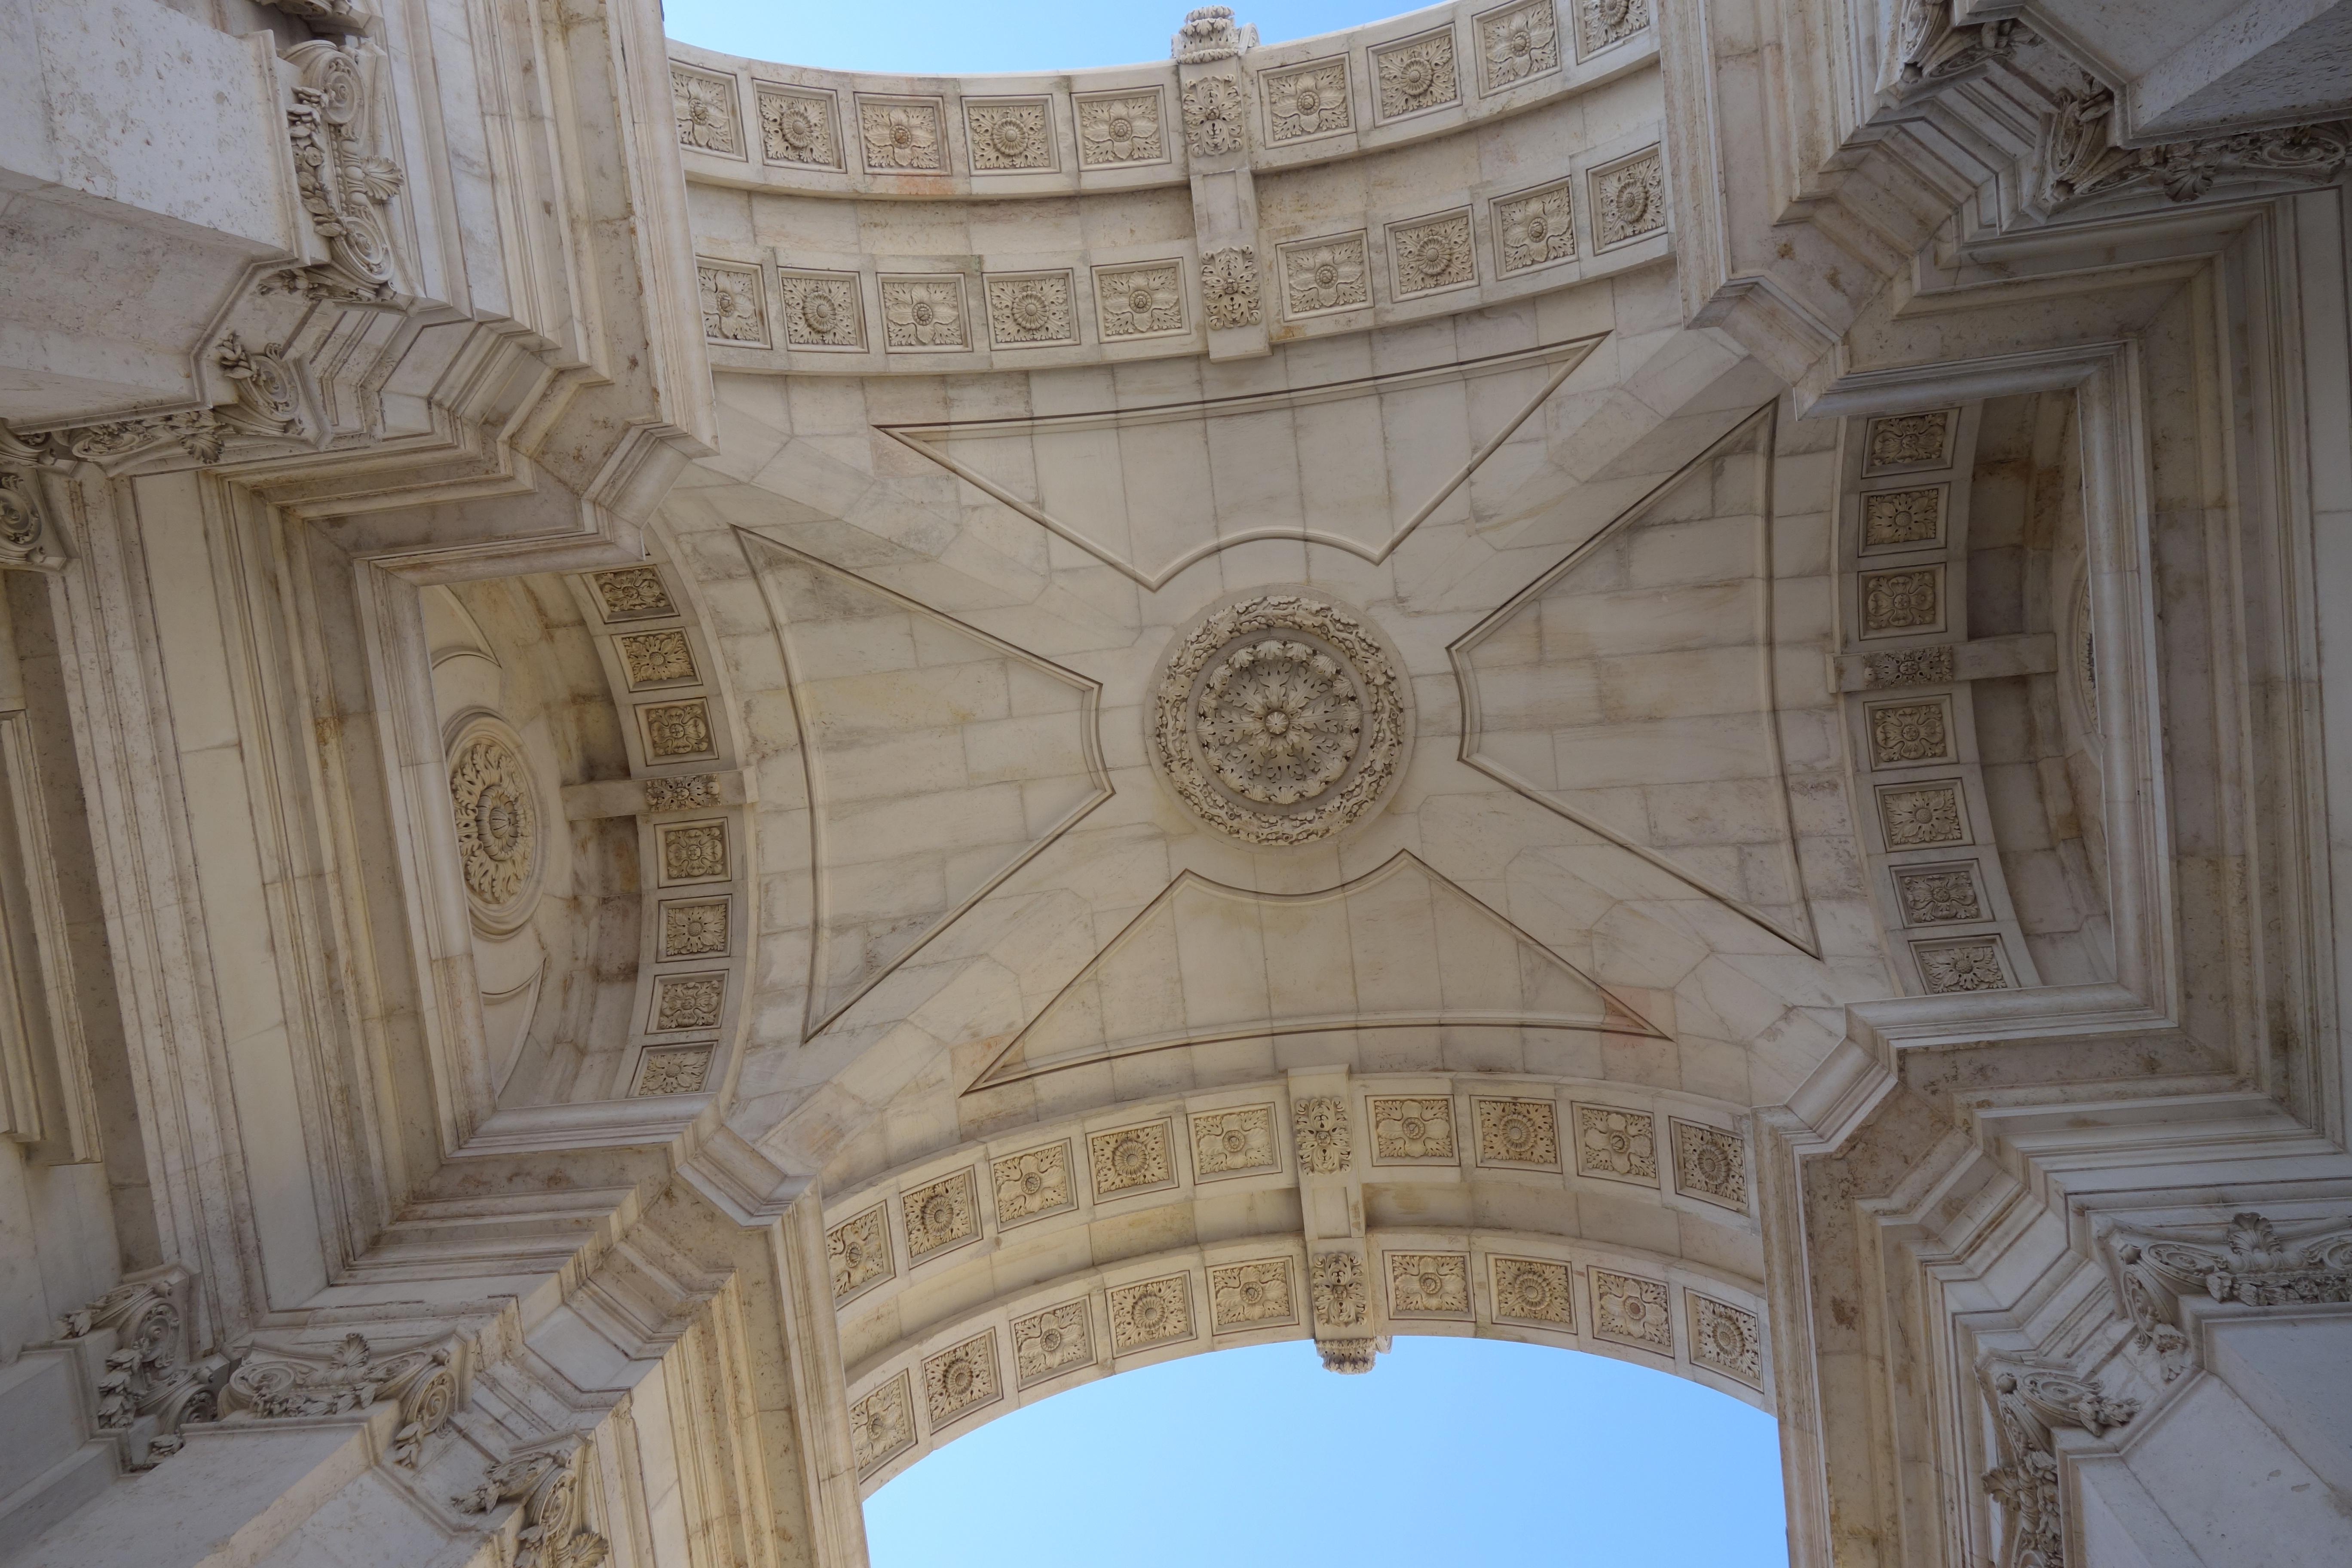 Lissabon: Praça do Comércio (Platz des Hadels) Triumphbogen Rua Augusta